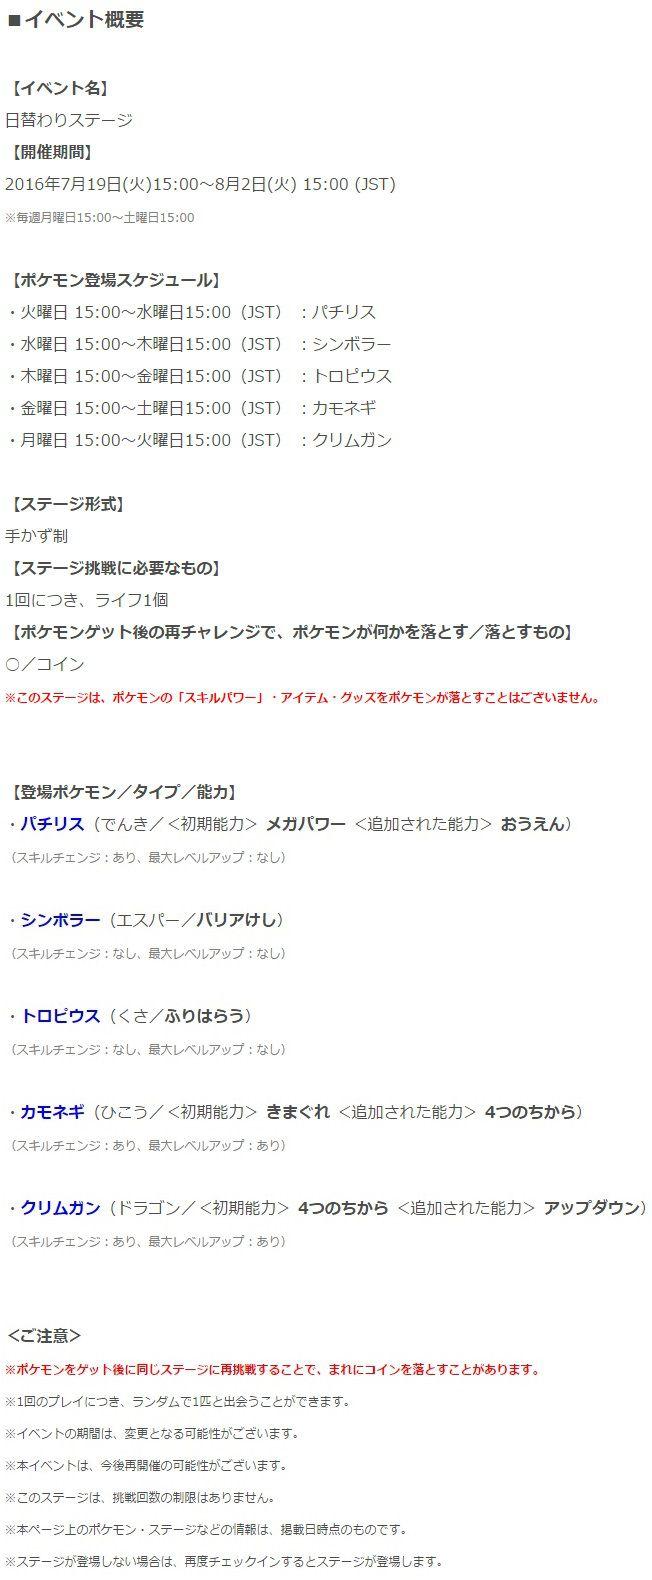 image_5574.jpg